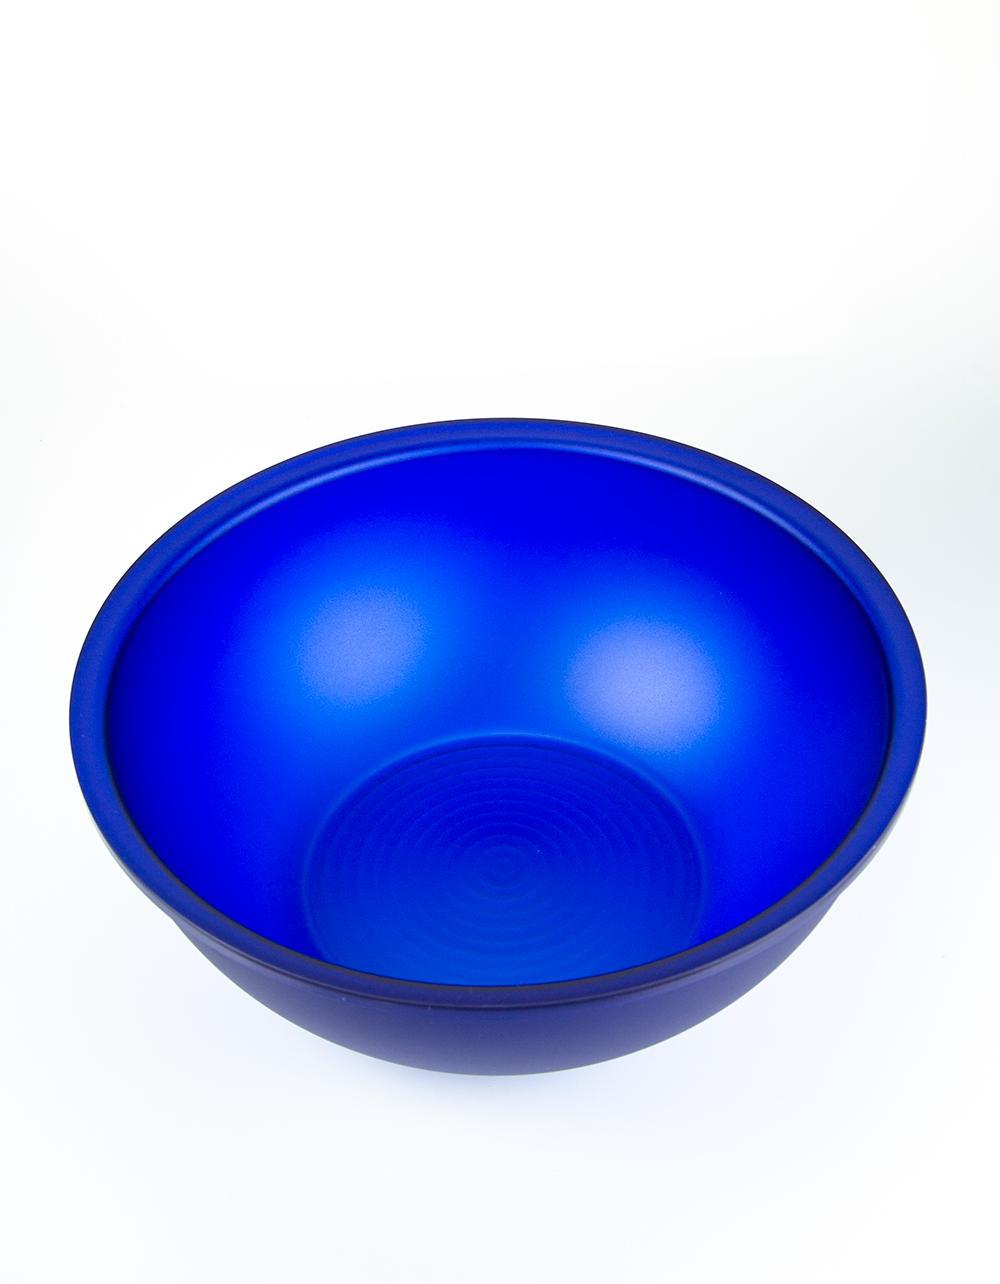 Salad Bowl Acrylic Glass - Sky Blue 29.5cm